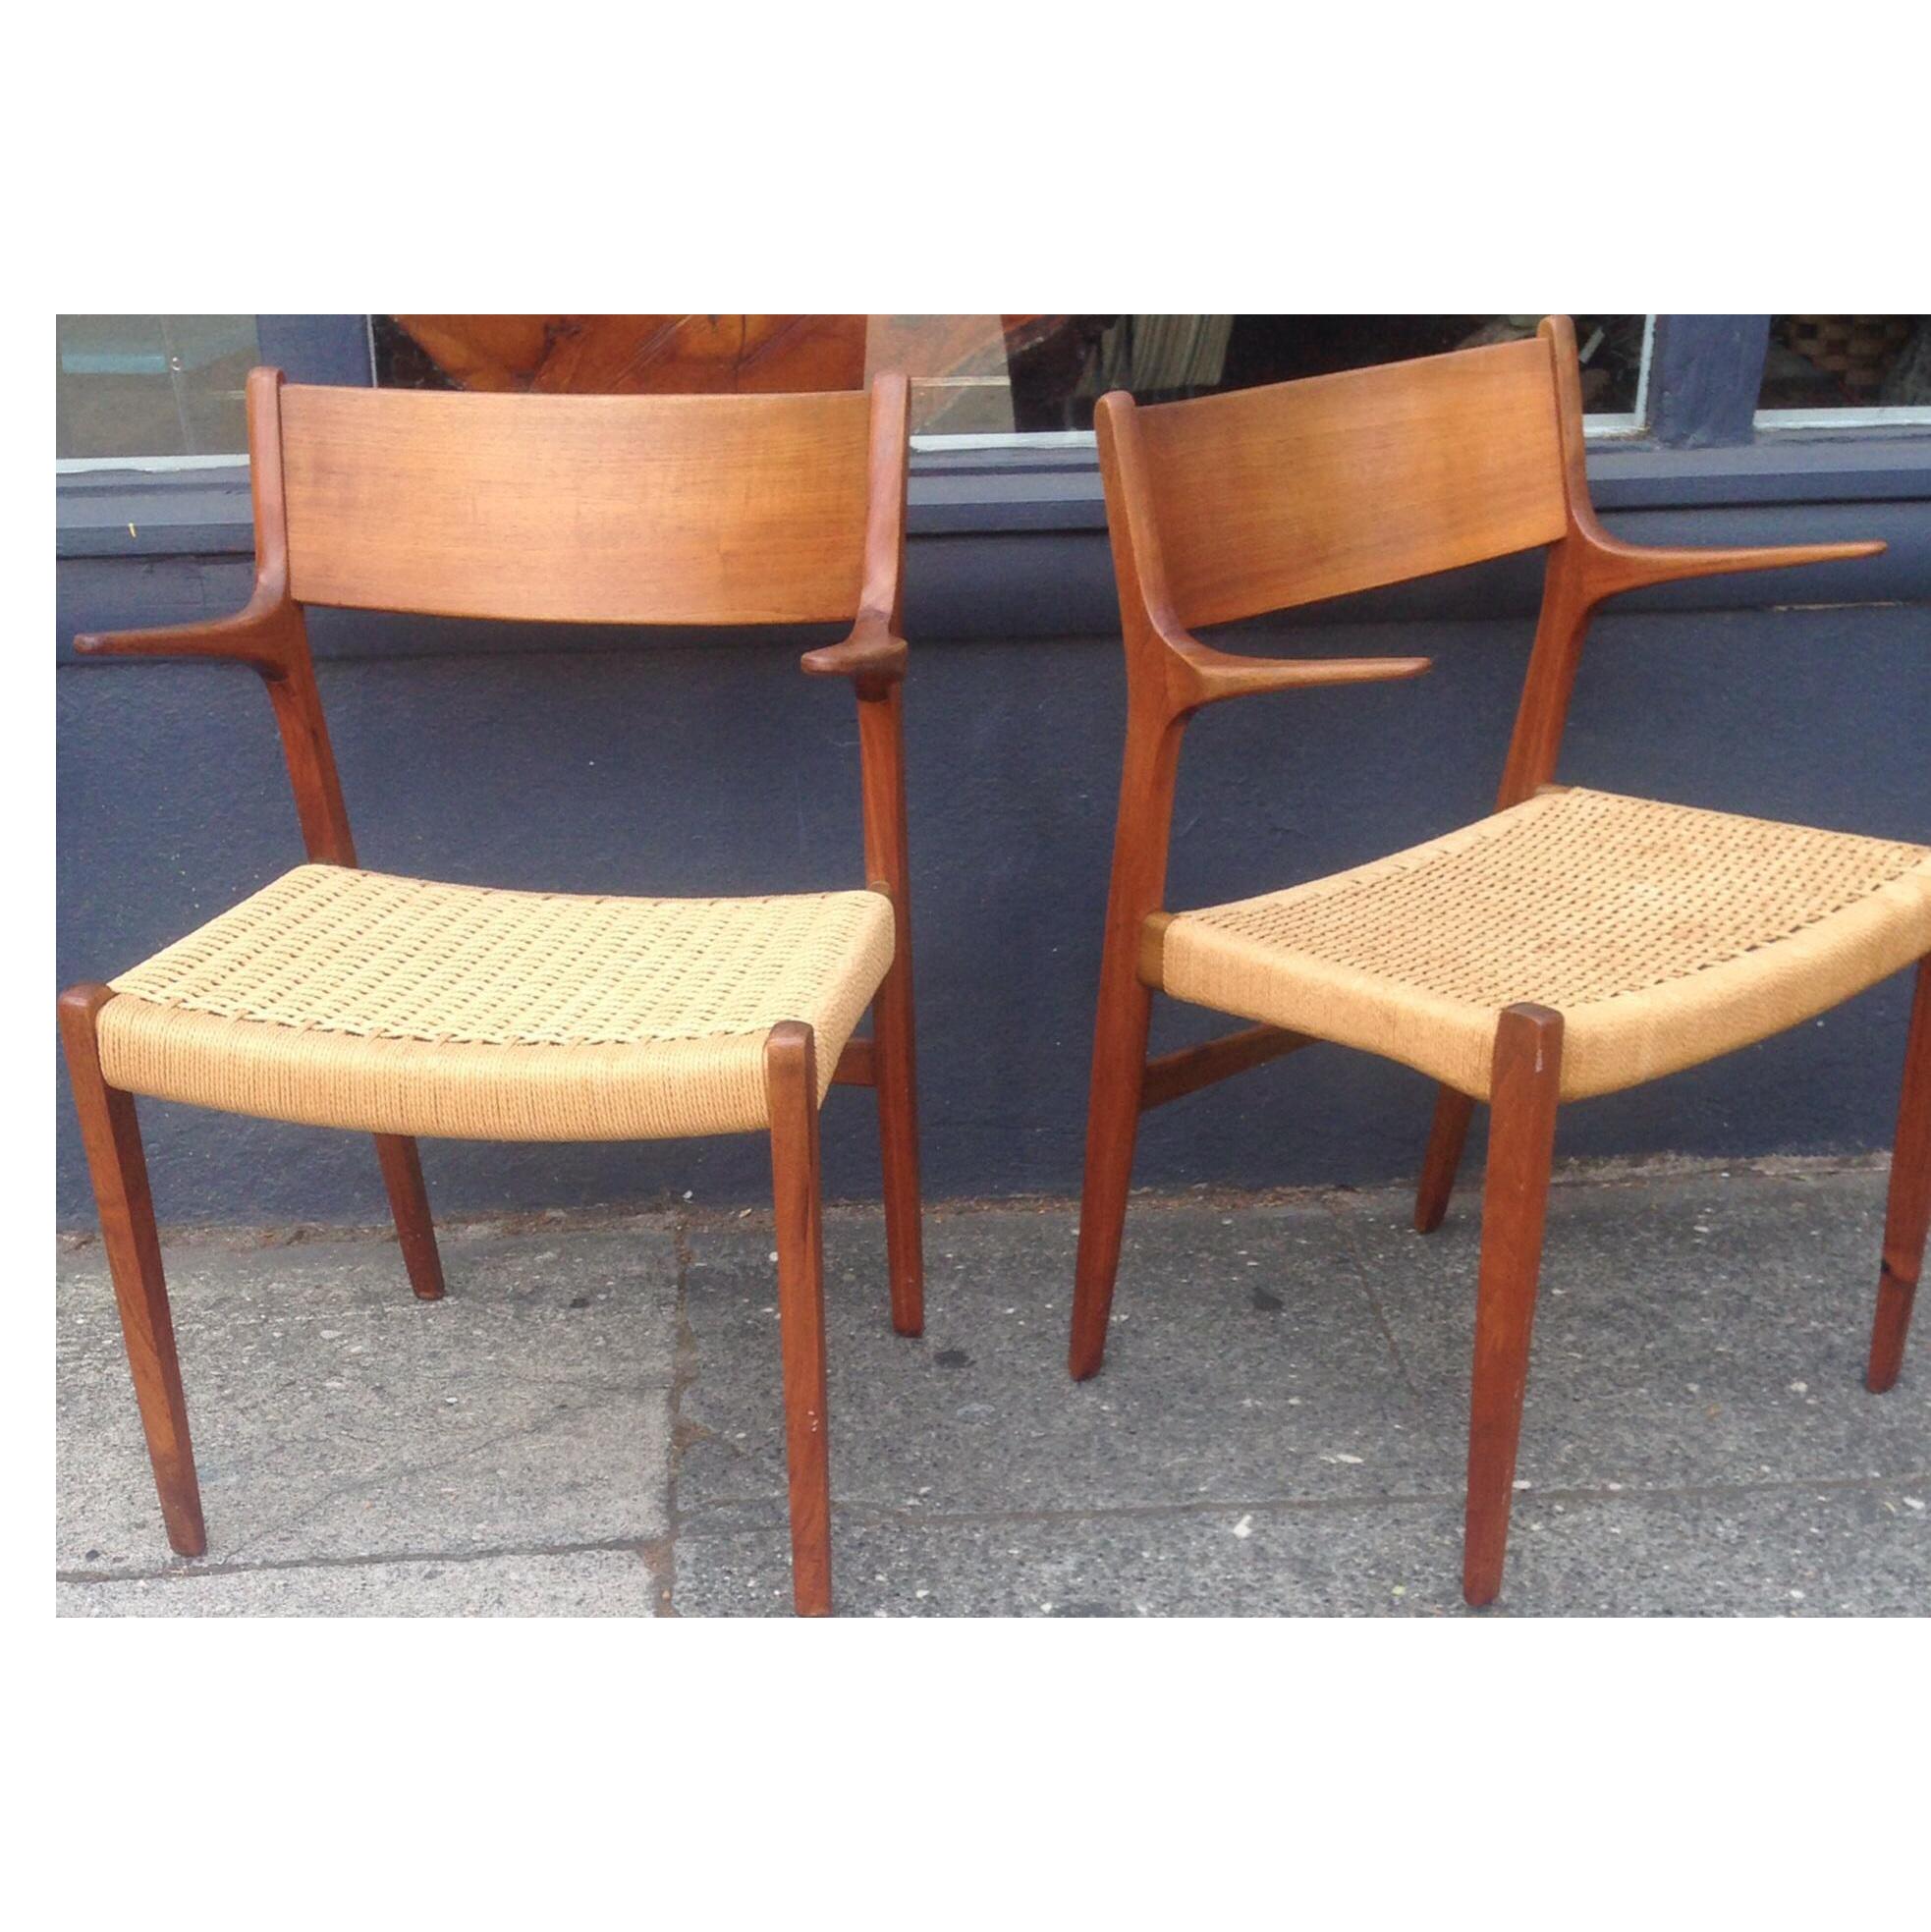 Danish Modern Teak Cord Chairs - A Pair on Chairish.com